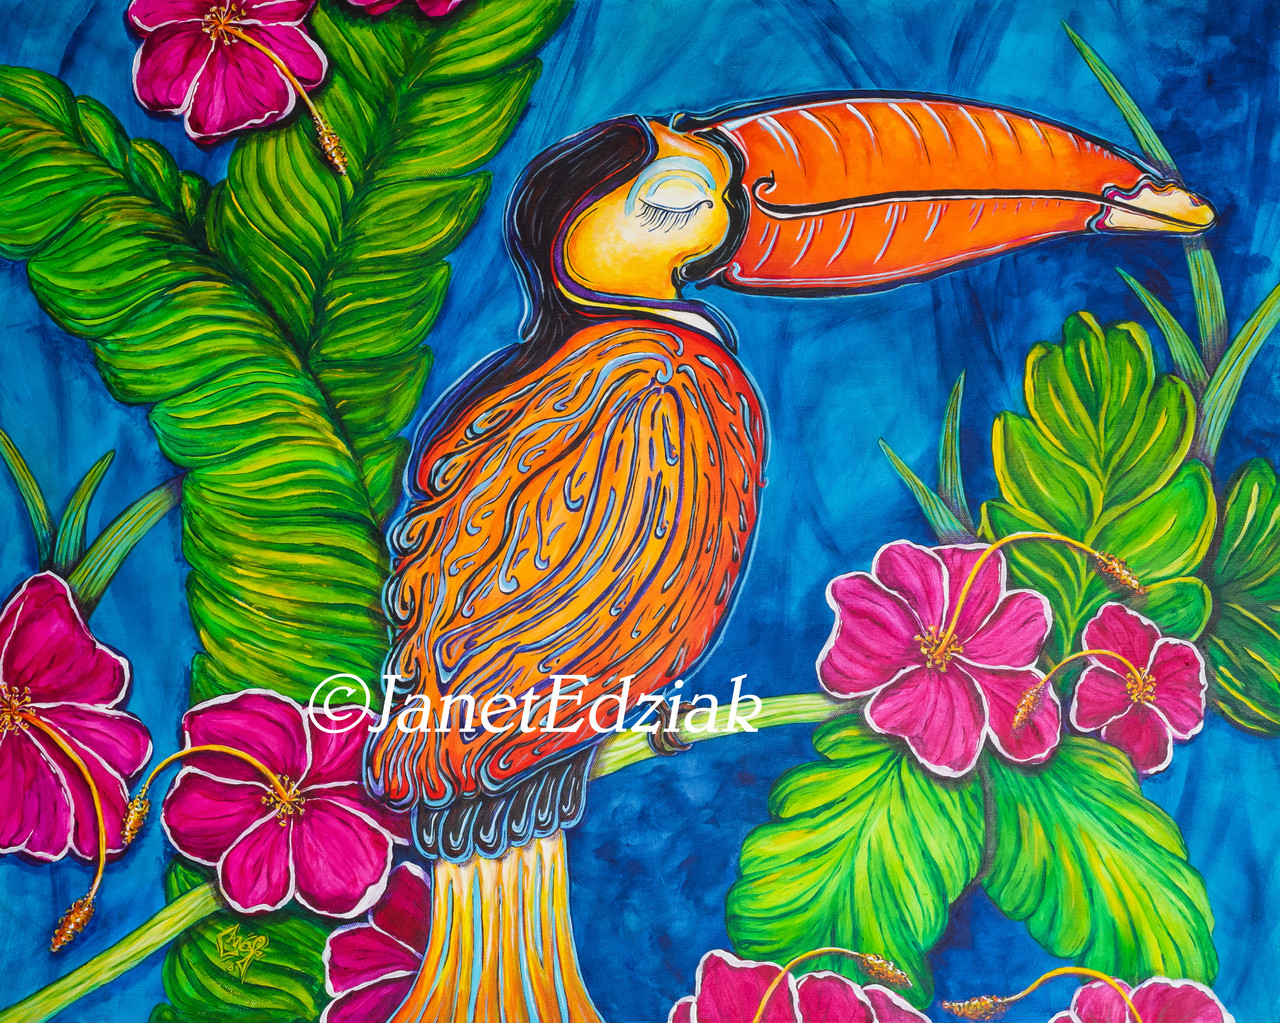 Polycotton Fabric Toucan Jungle Tropical Animal